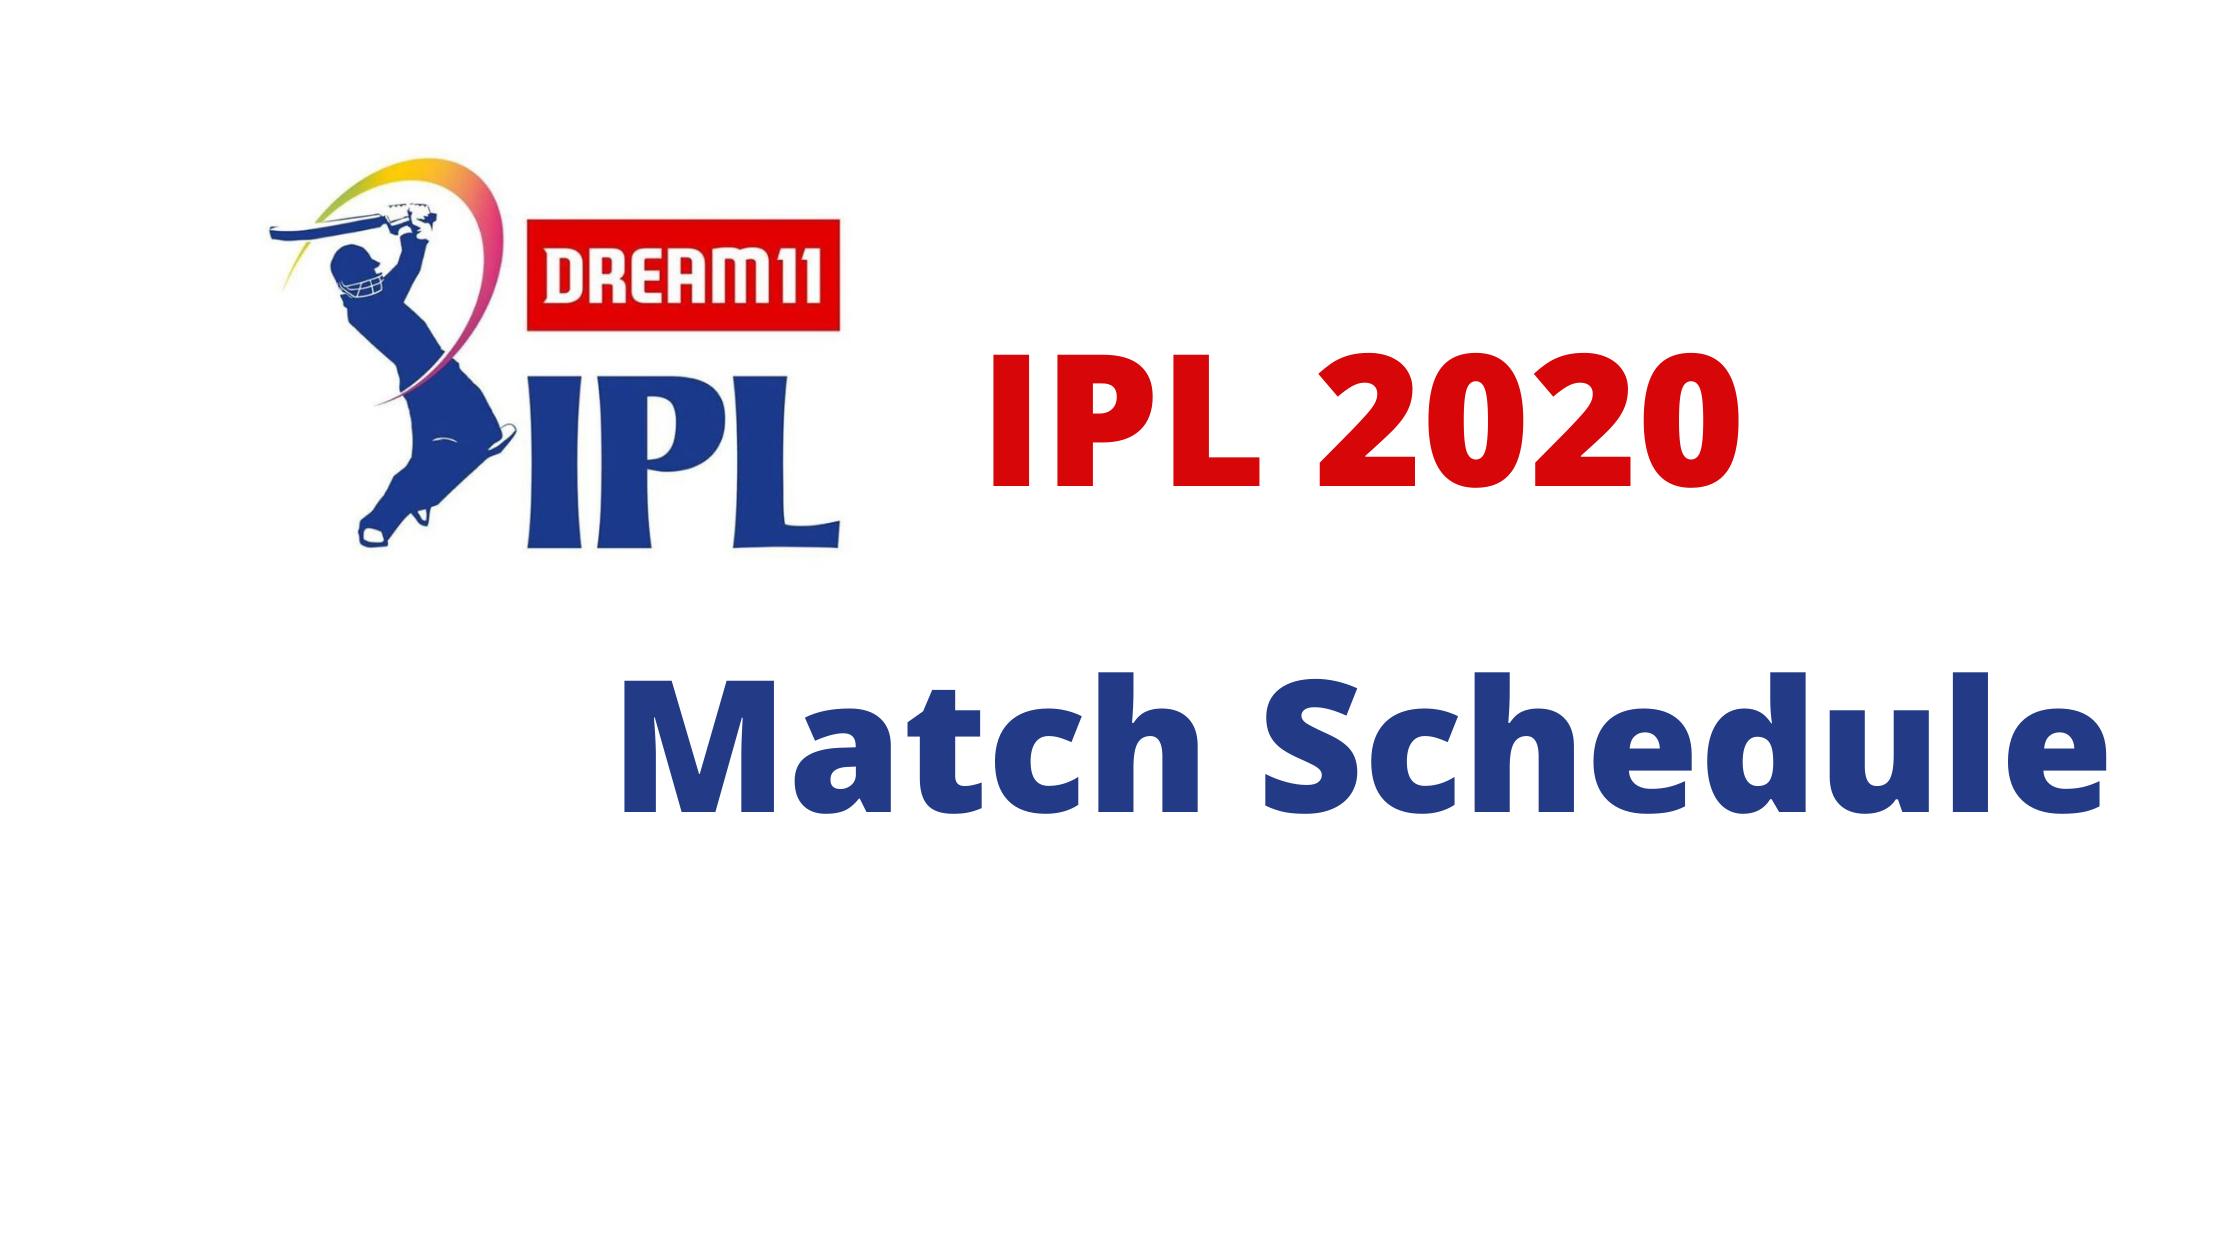 Dream11 IPL 2020 Match Schedule